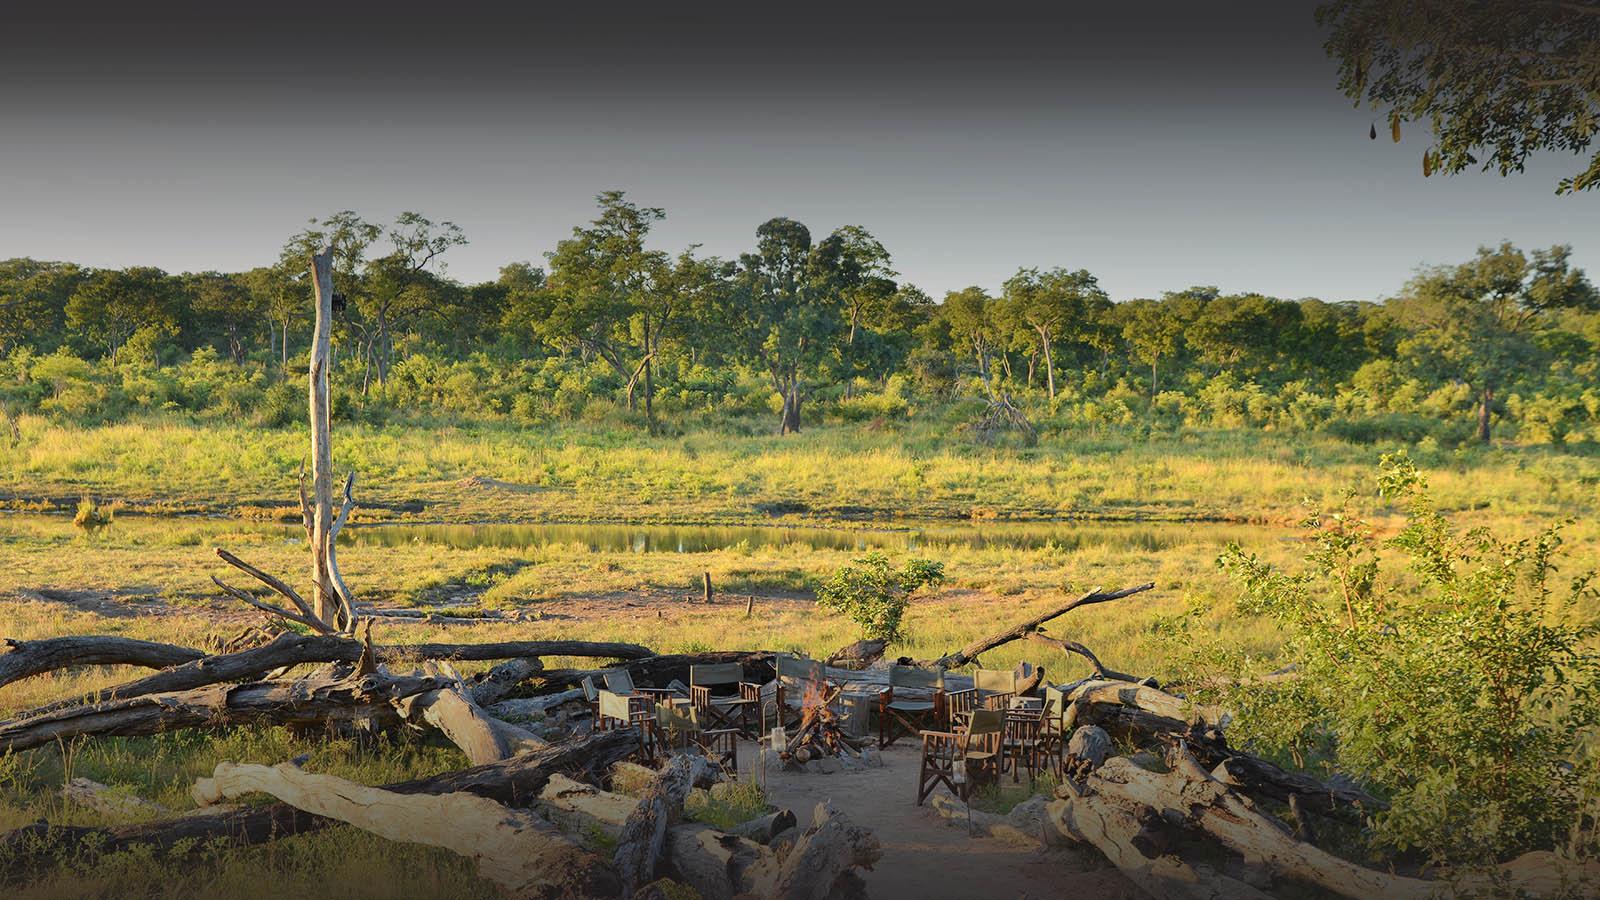 khulu bush camp zimbabwe-lodges-zambia-in-style-safaris-wildlife-africa-hwange-national-park-camp-fire